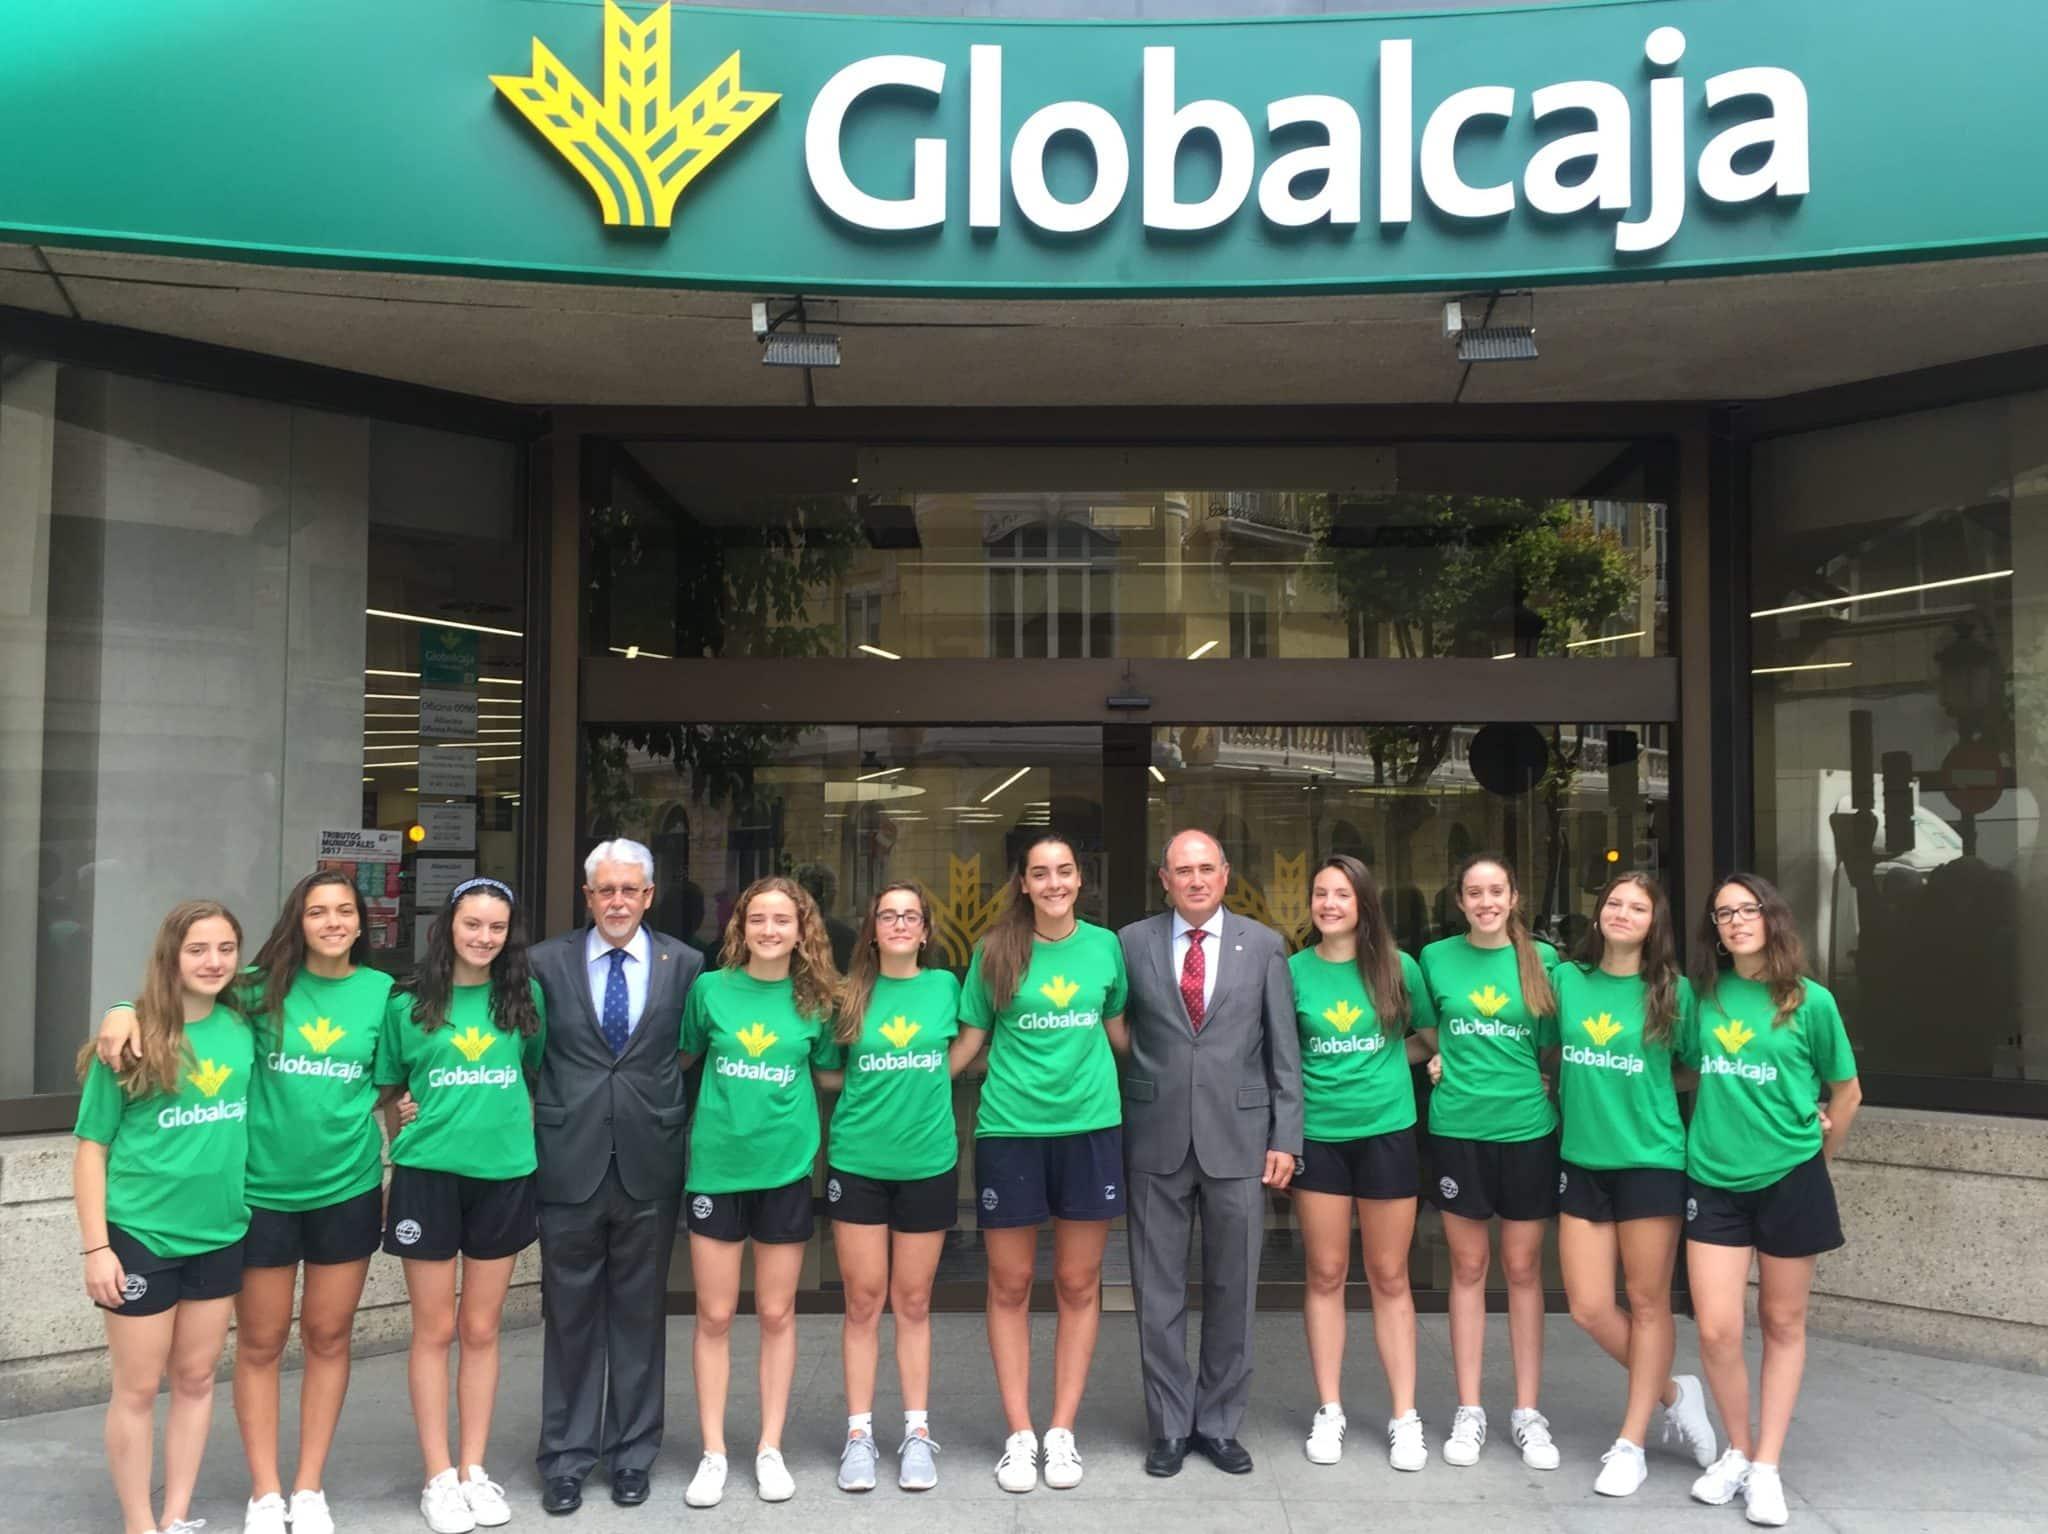 https://blog.globalcaja.es/wp-content/uploads/2017/07/club-voleibol.jpeg